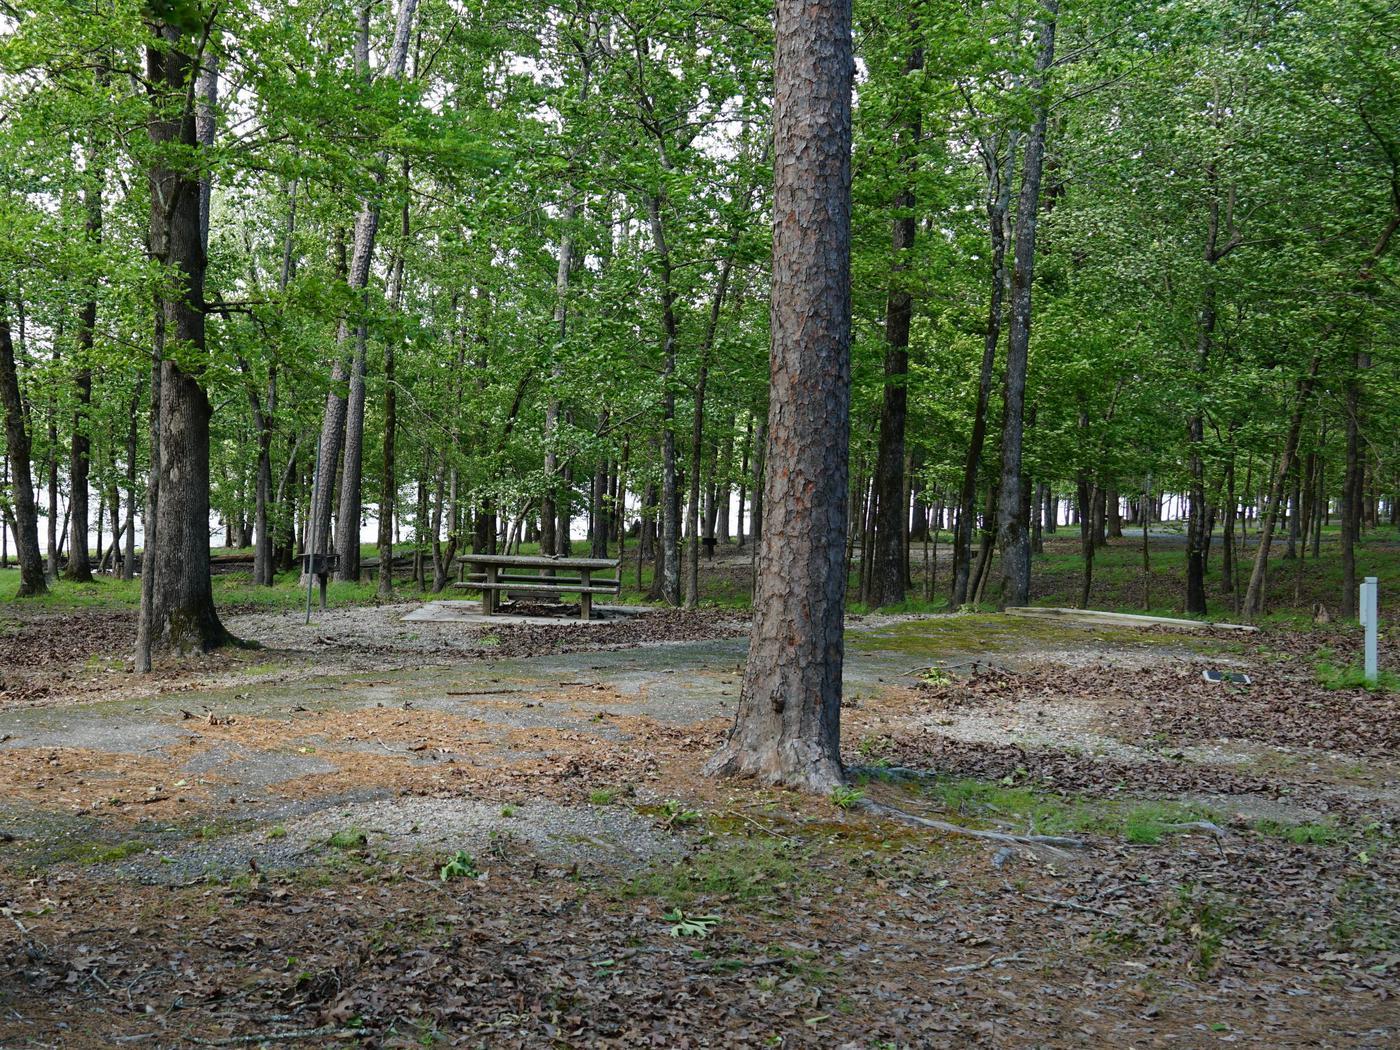 Tompkins Bend Campground, campsite # 71